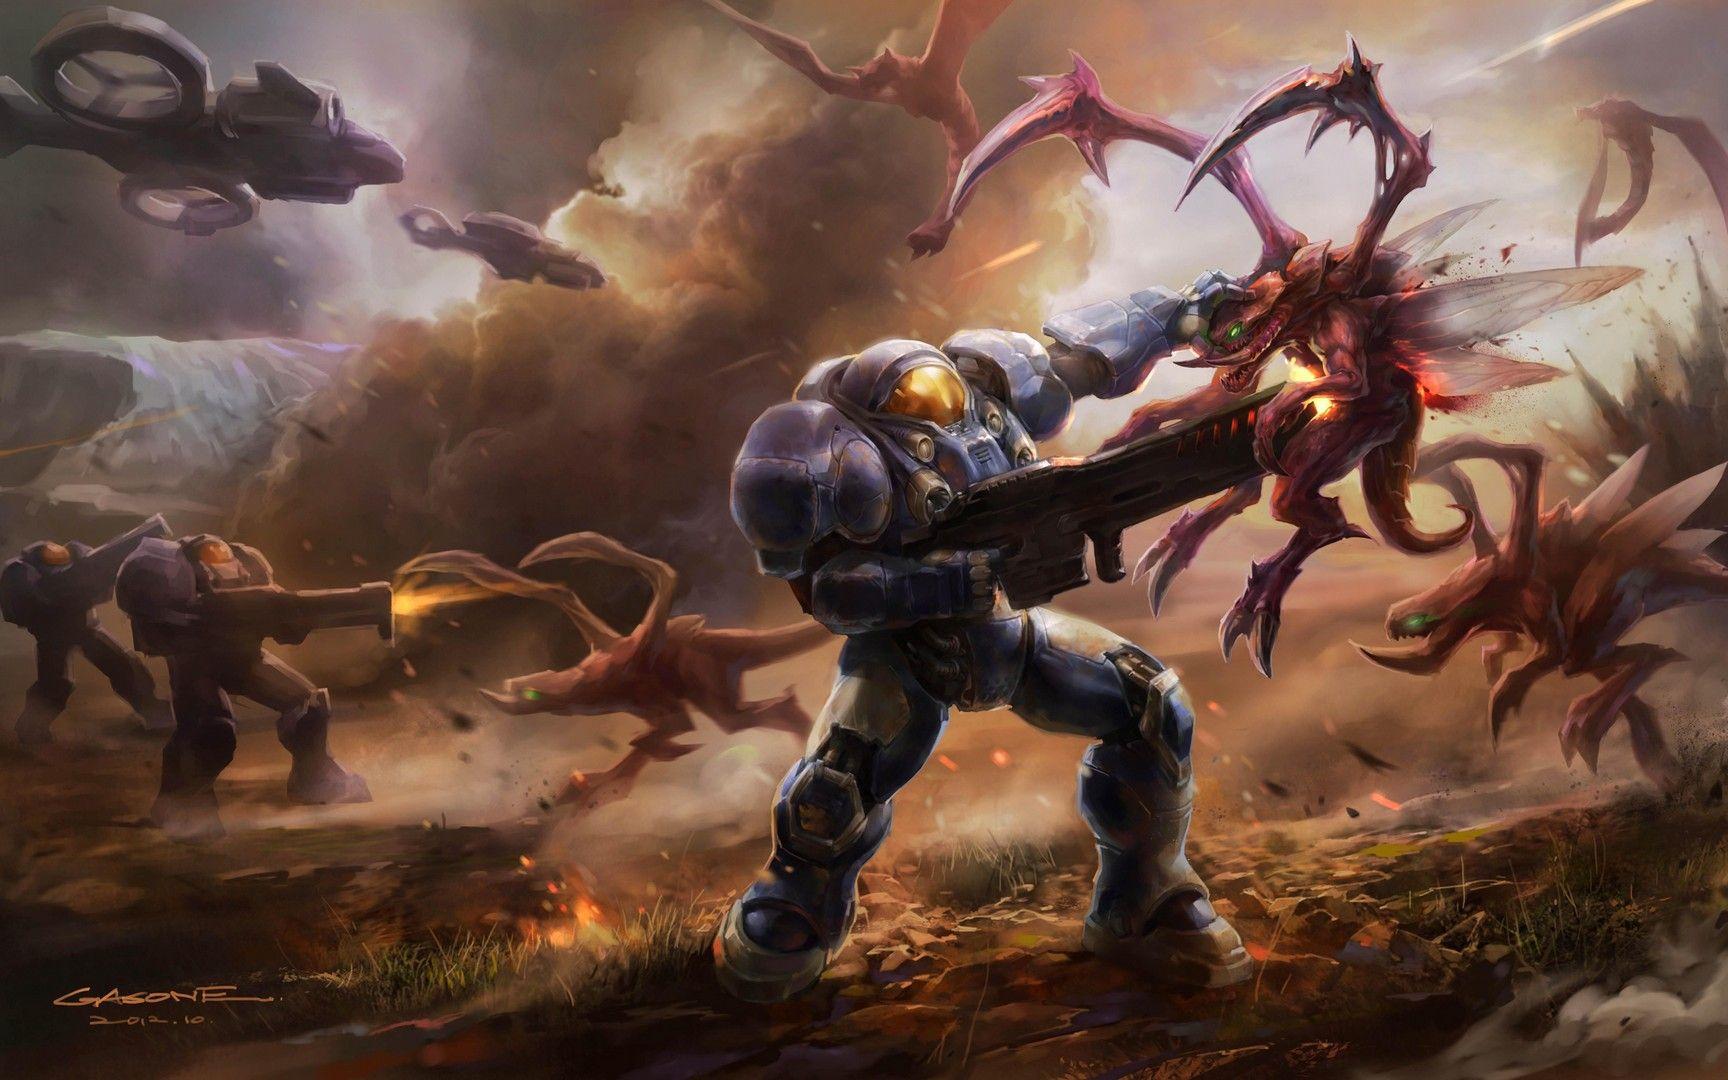 starcraft-2-zerg-wallpapers-best | Игровые арты, Комиксы ...